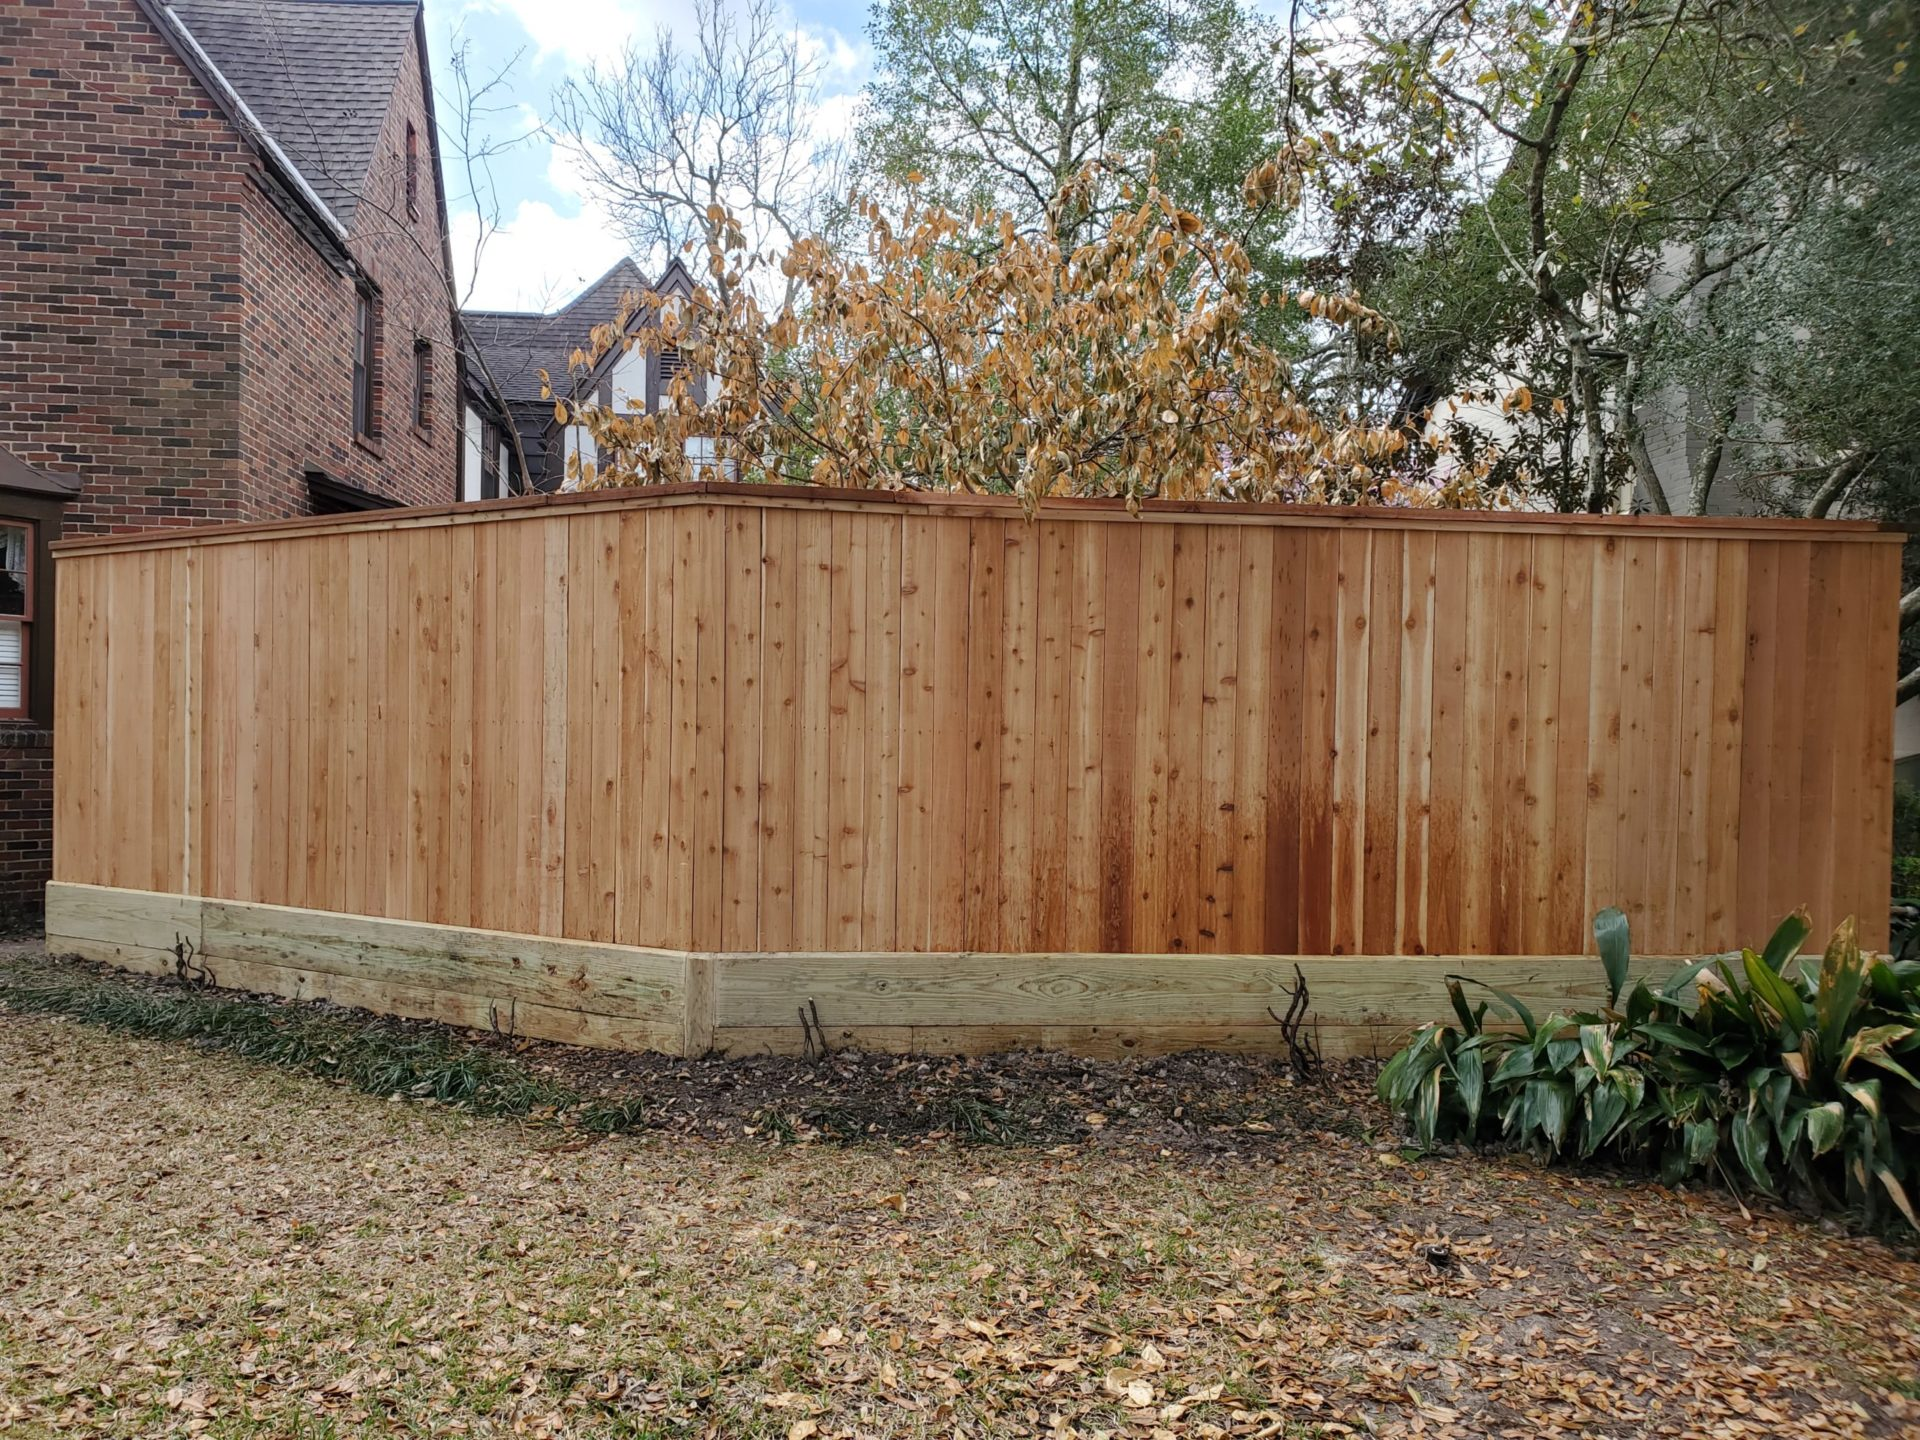 fence in houston texas